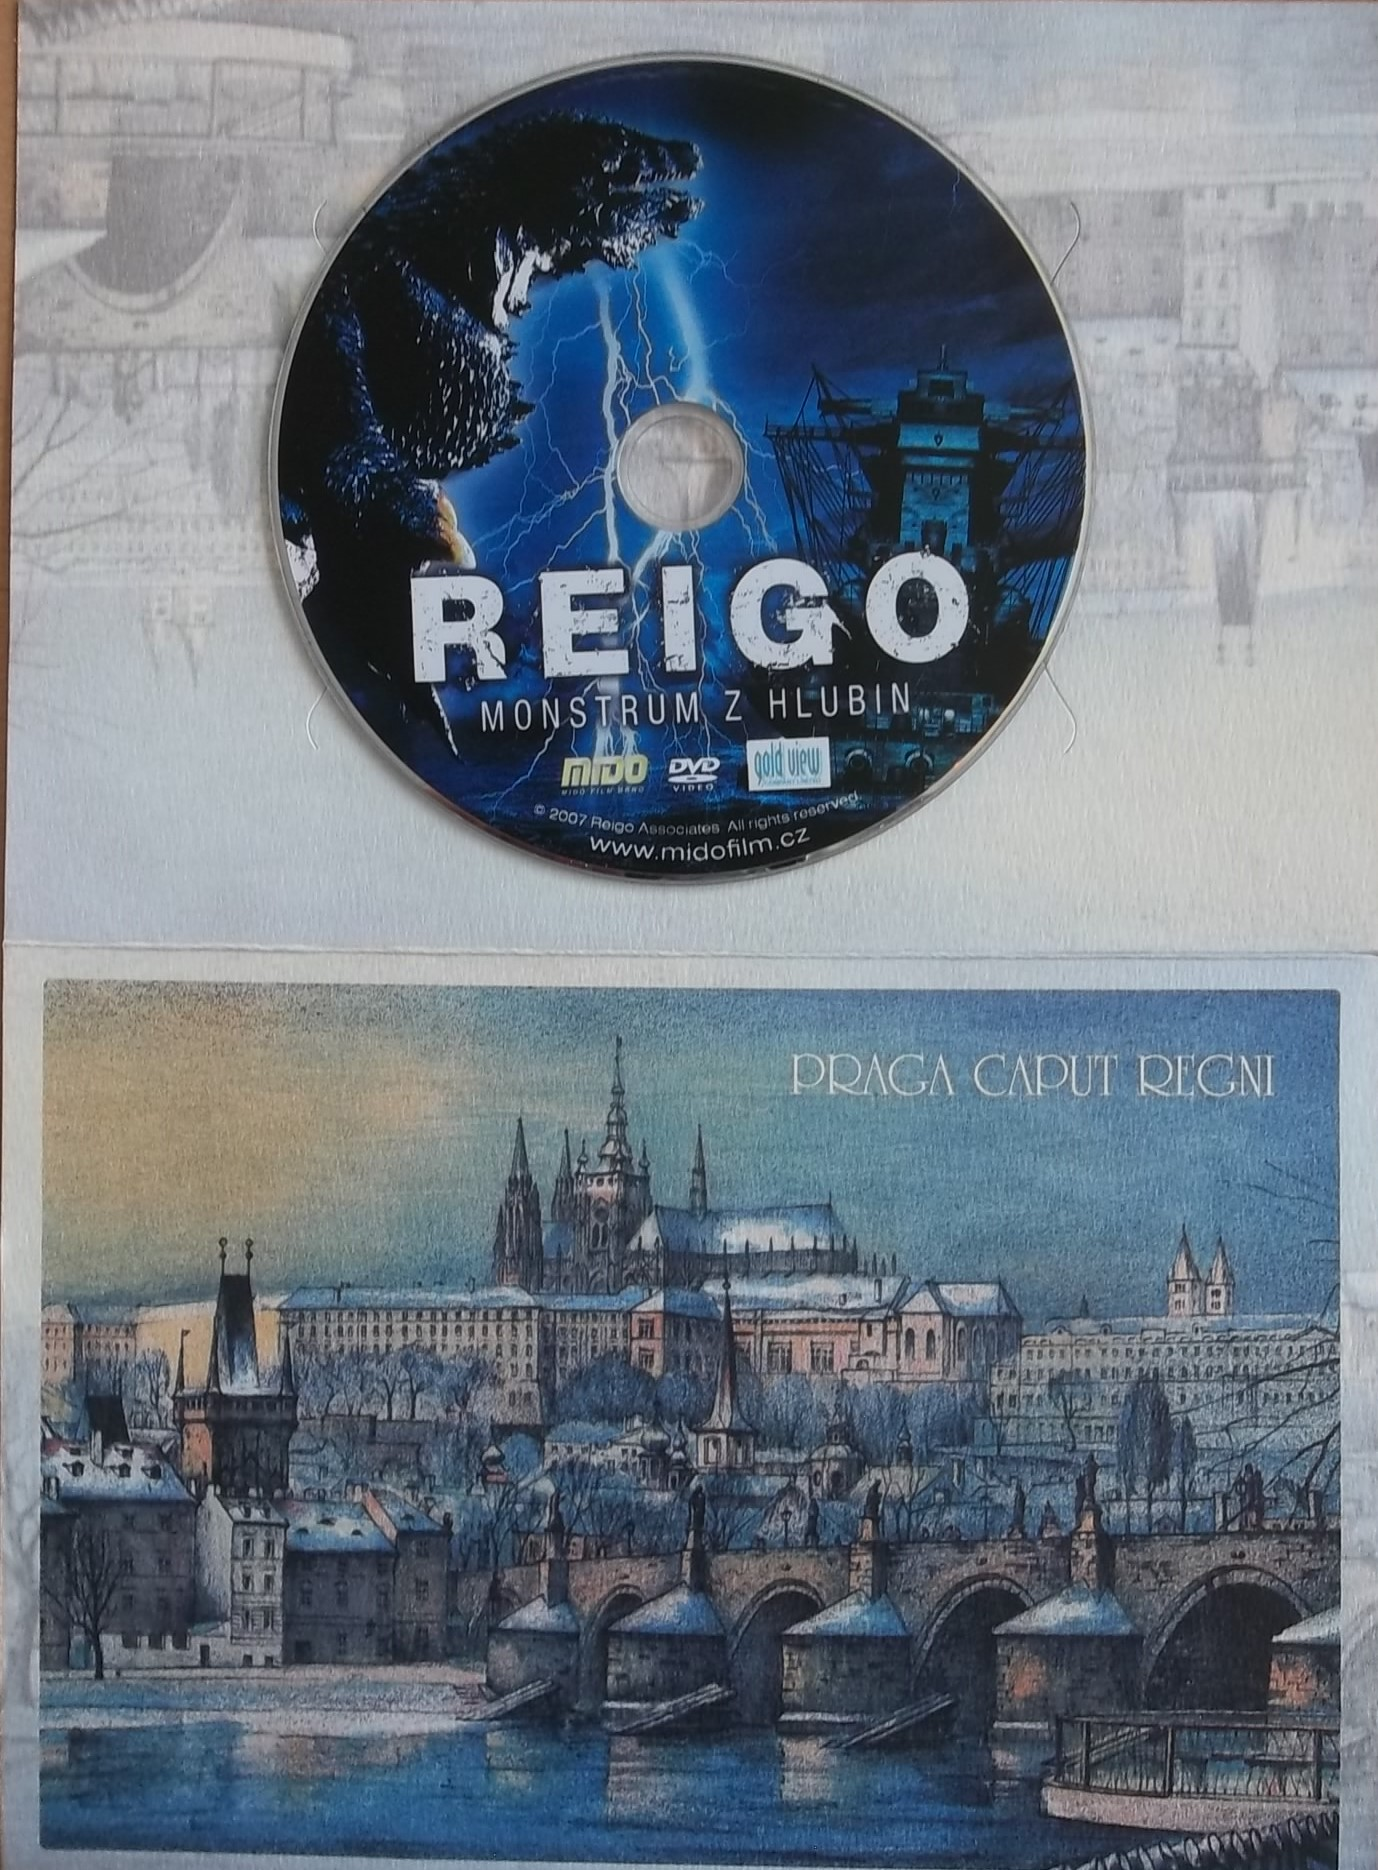 Reigo - Monstrum z hlubin - DVD